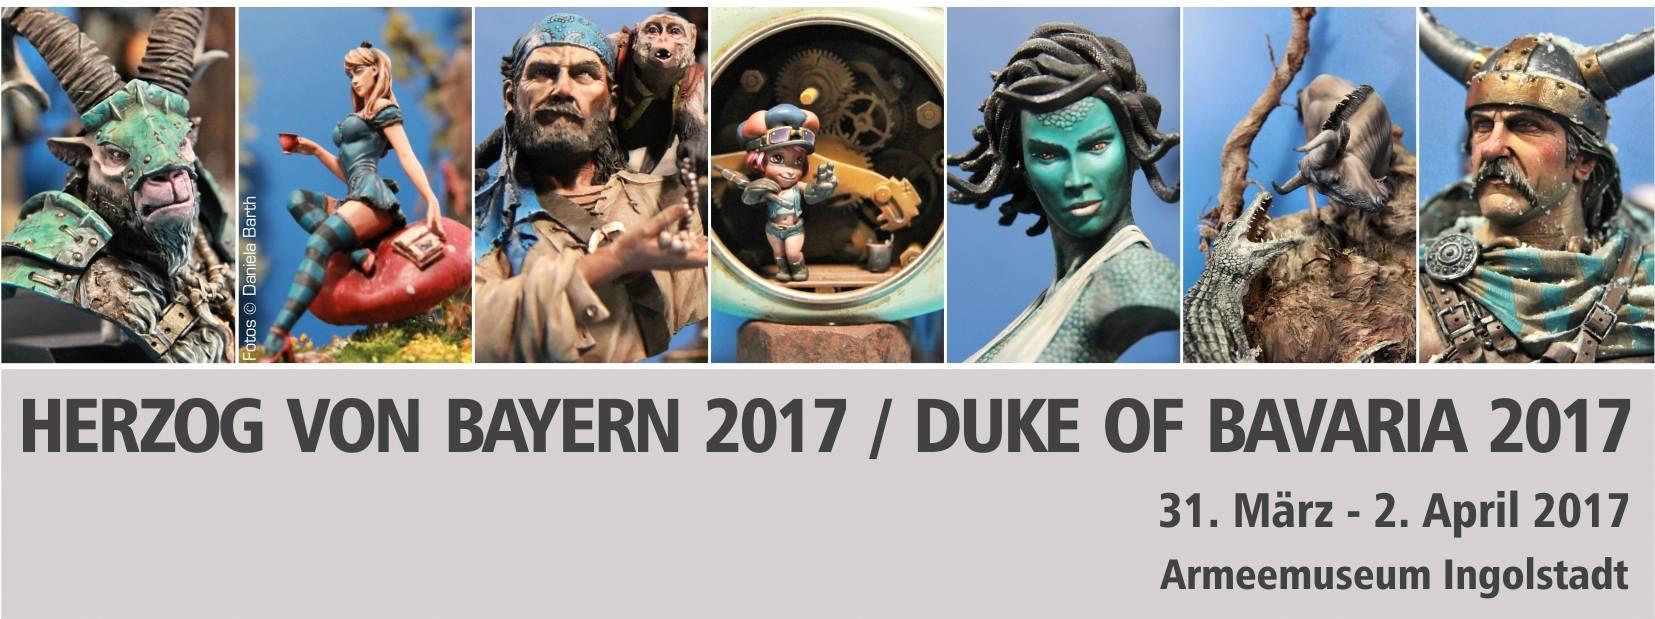 dukeofbavaria-herzogvonbayern-event-2017